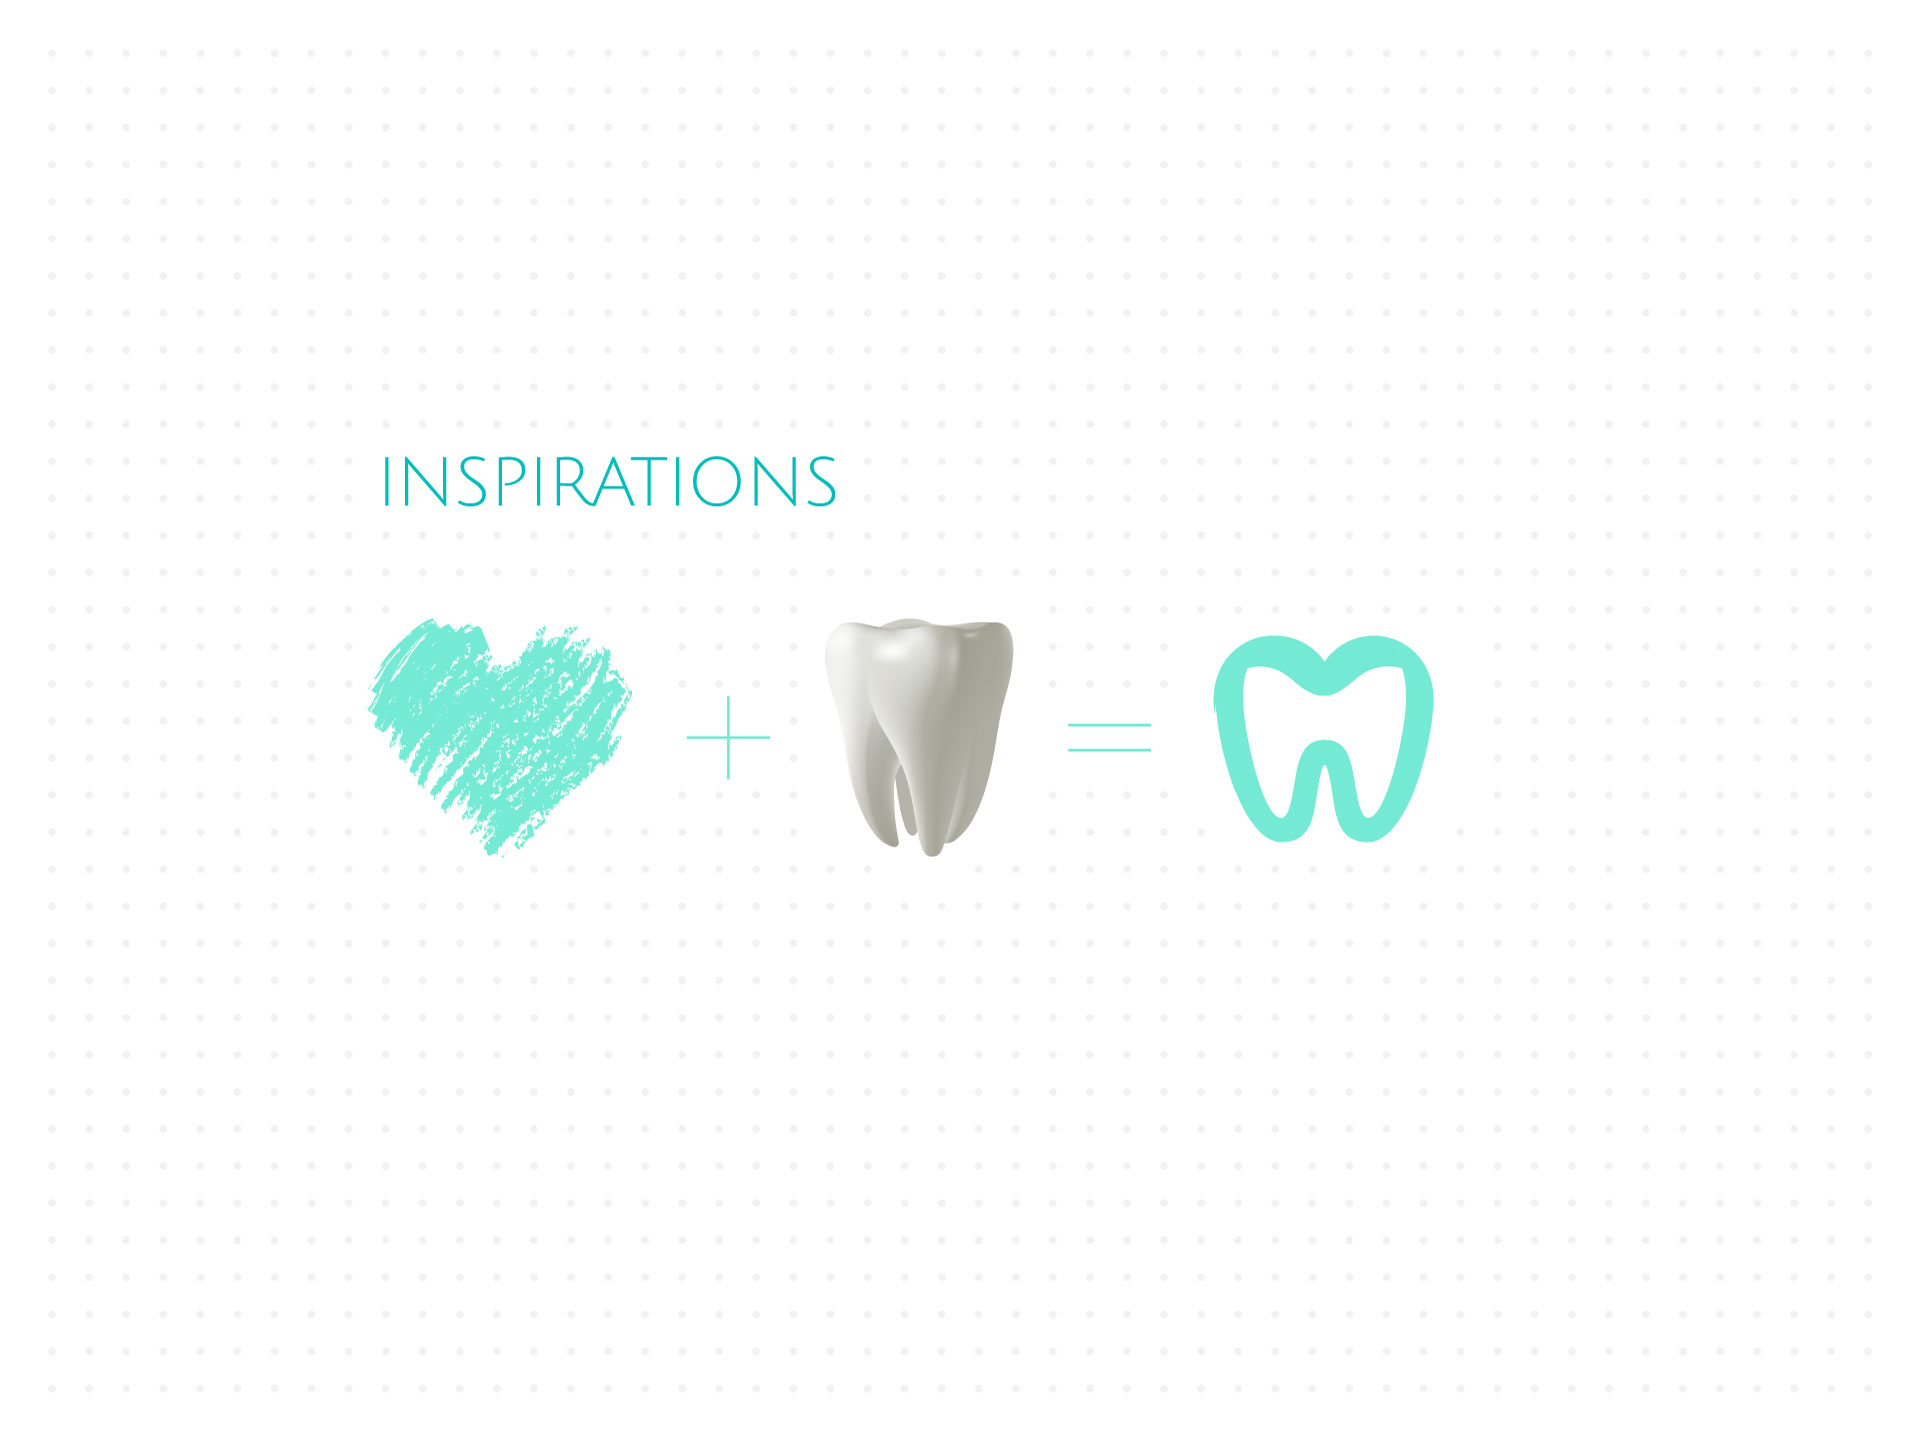 knoxfield dental medical branding by Z Creative Studio Branding & Graphic Design Melbourne